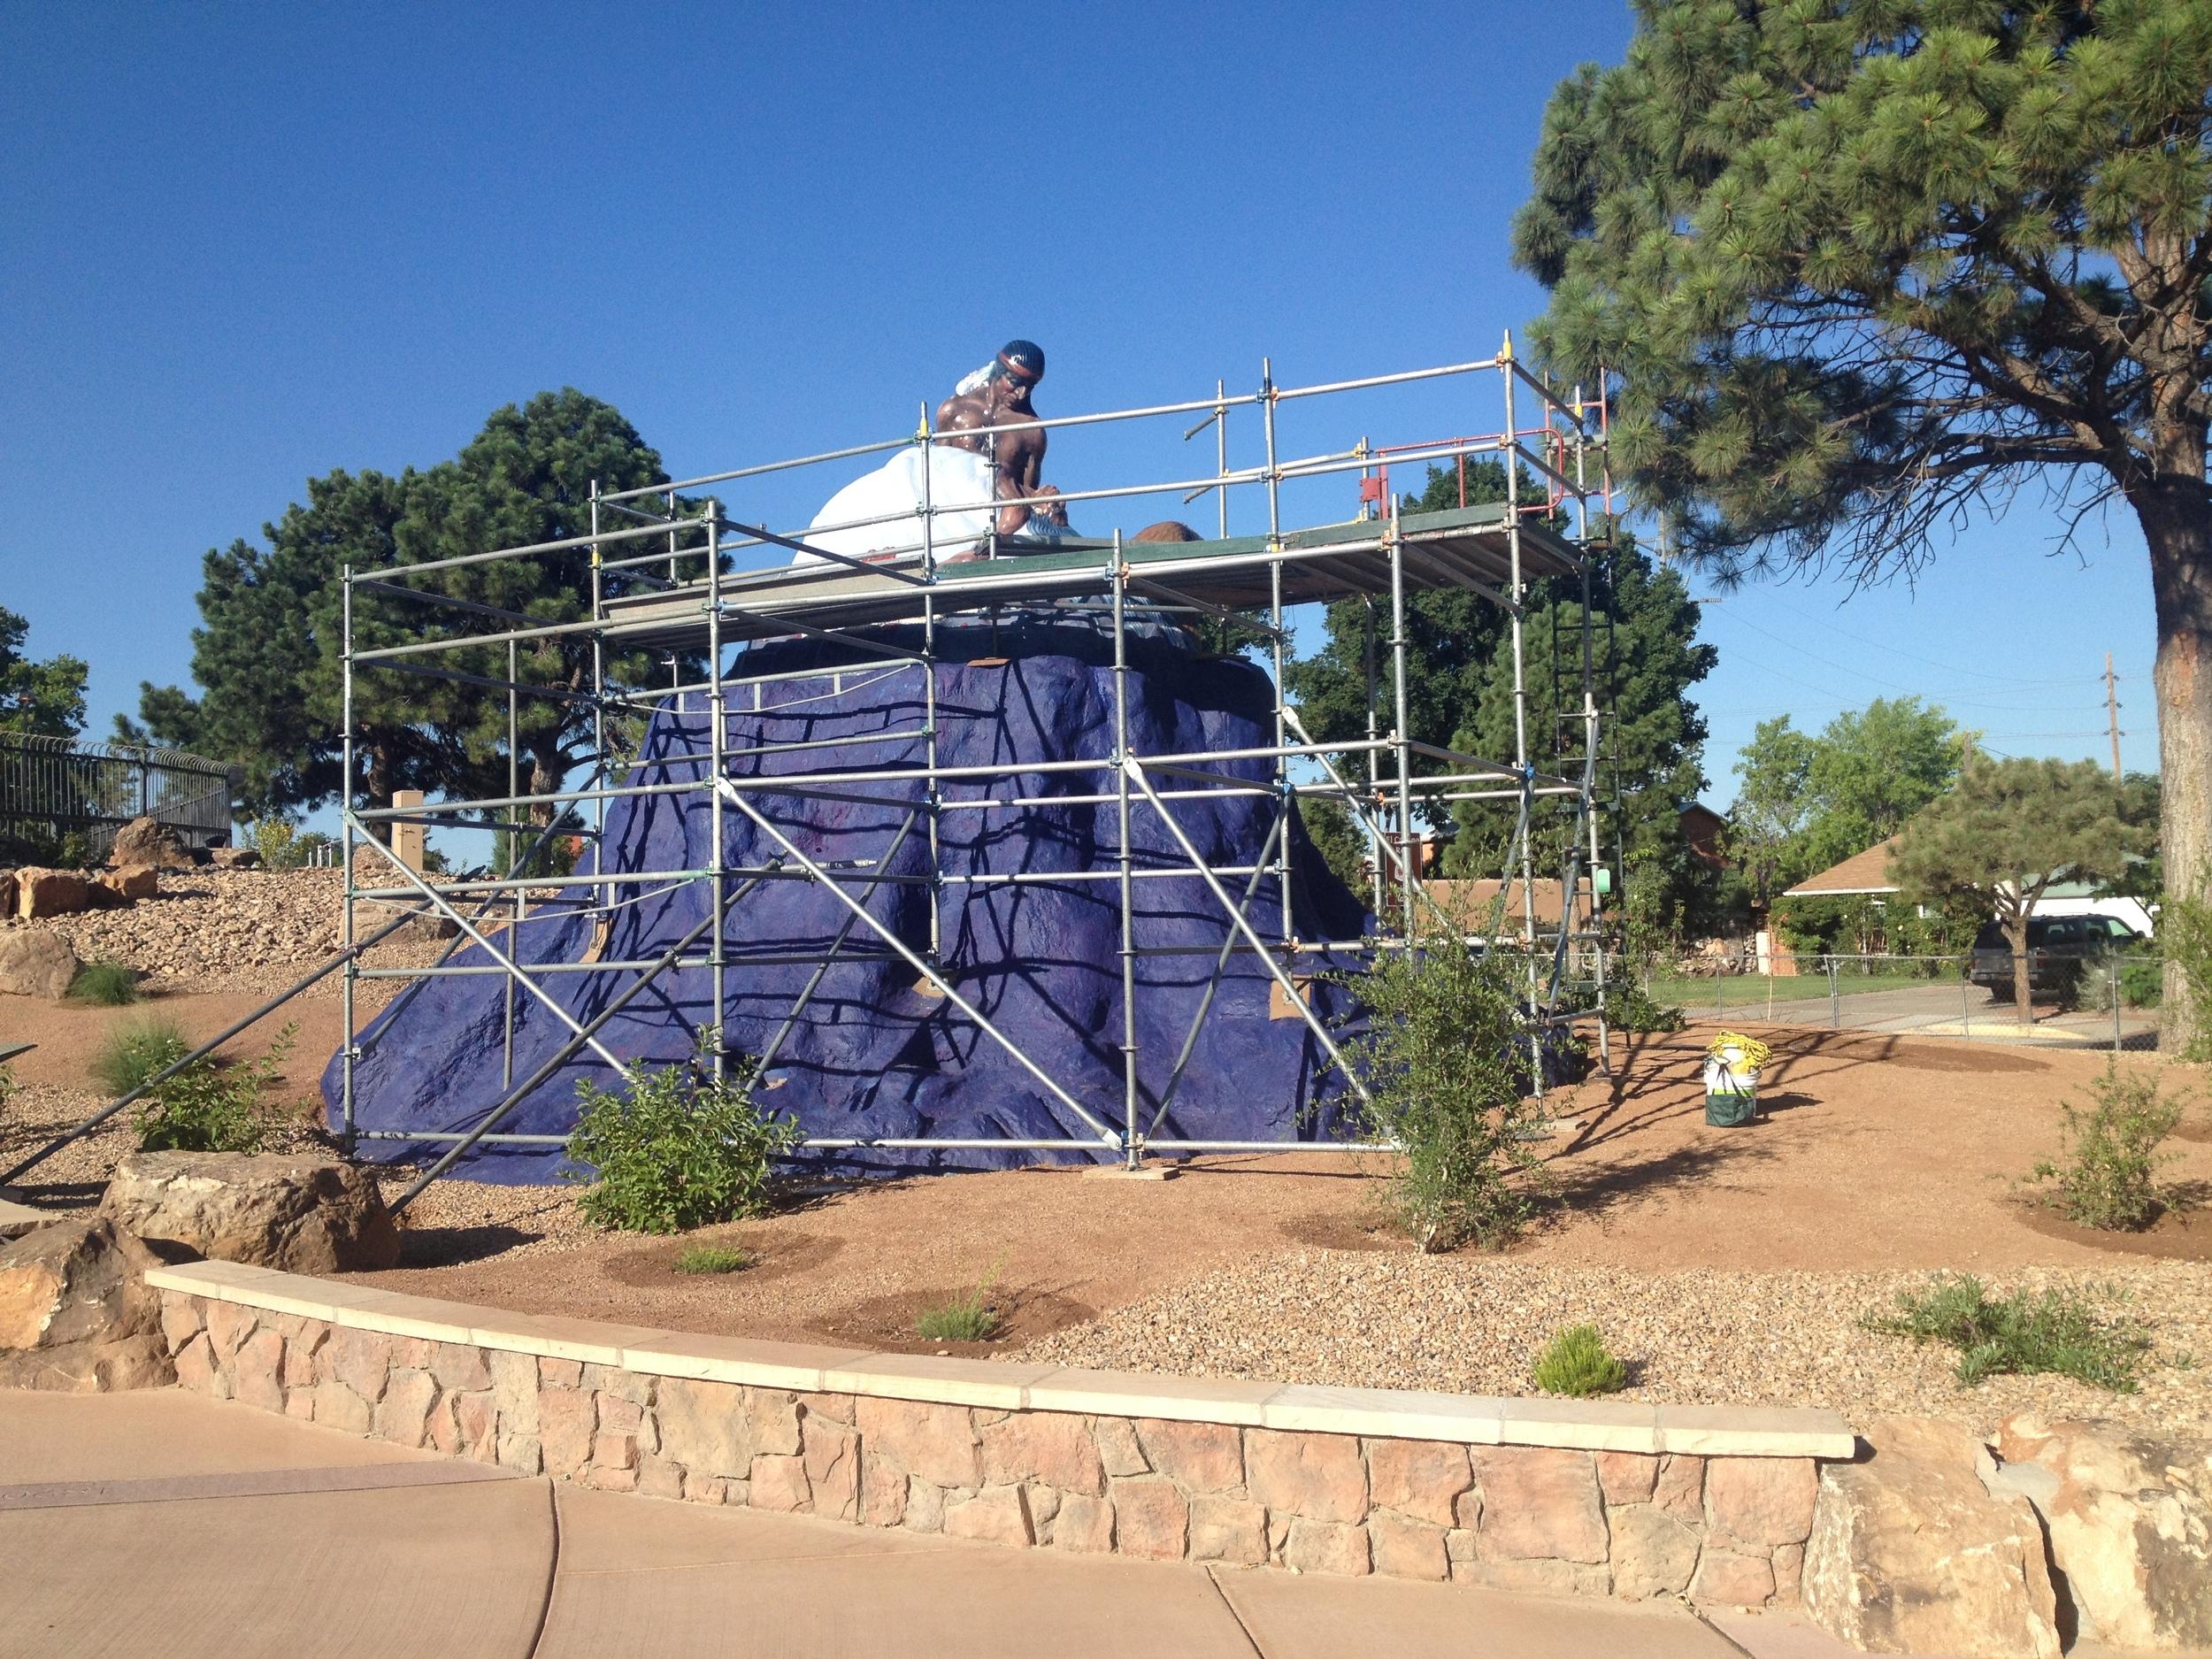 Restoration of a Luis Jumenez, City of Alb. Public Art Program, 2016